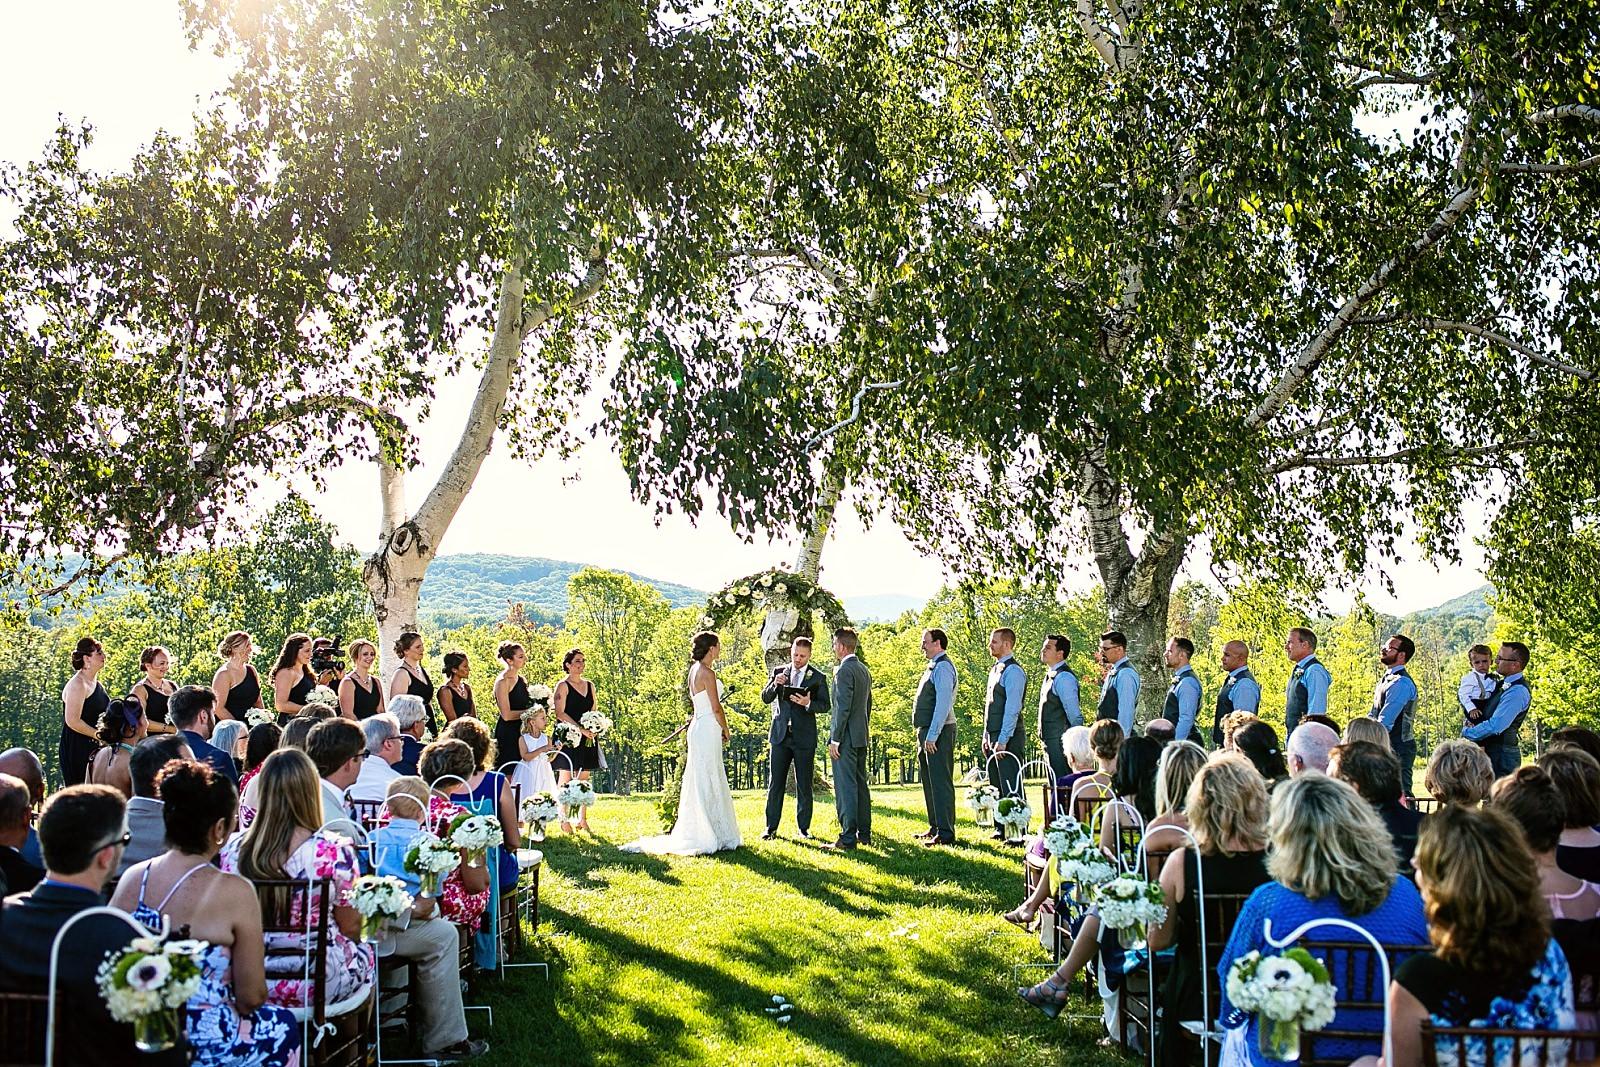 CT_Wedding_Photographer_LiNa_Wed_39.jpg